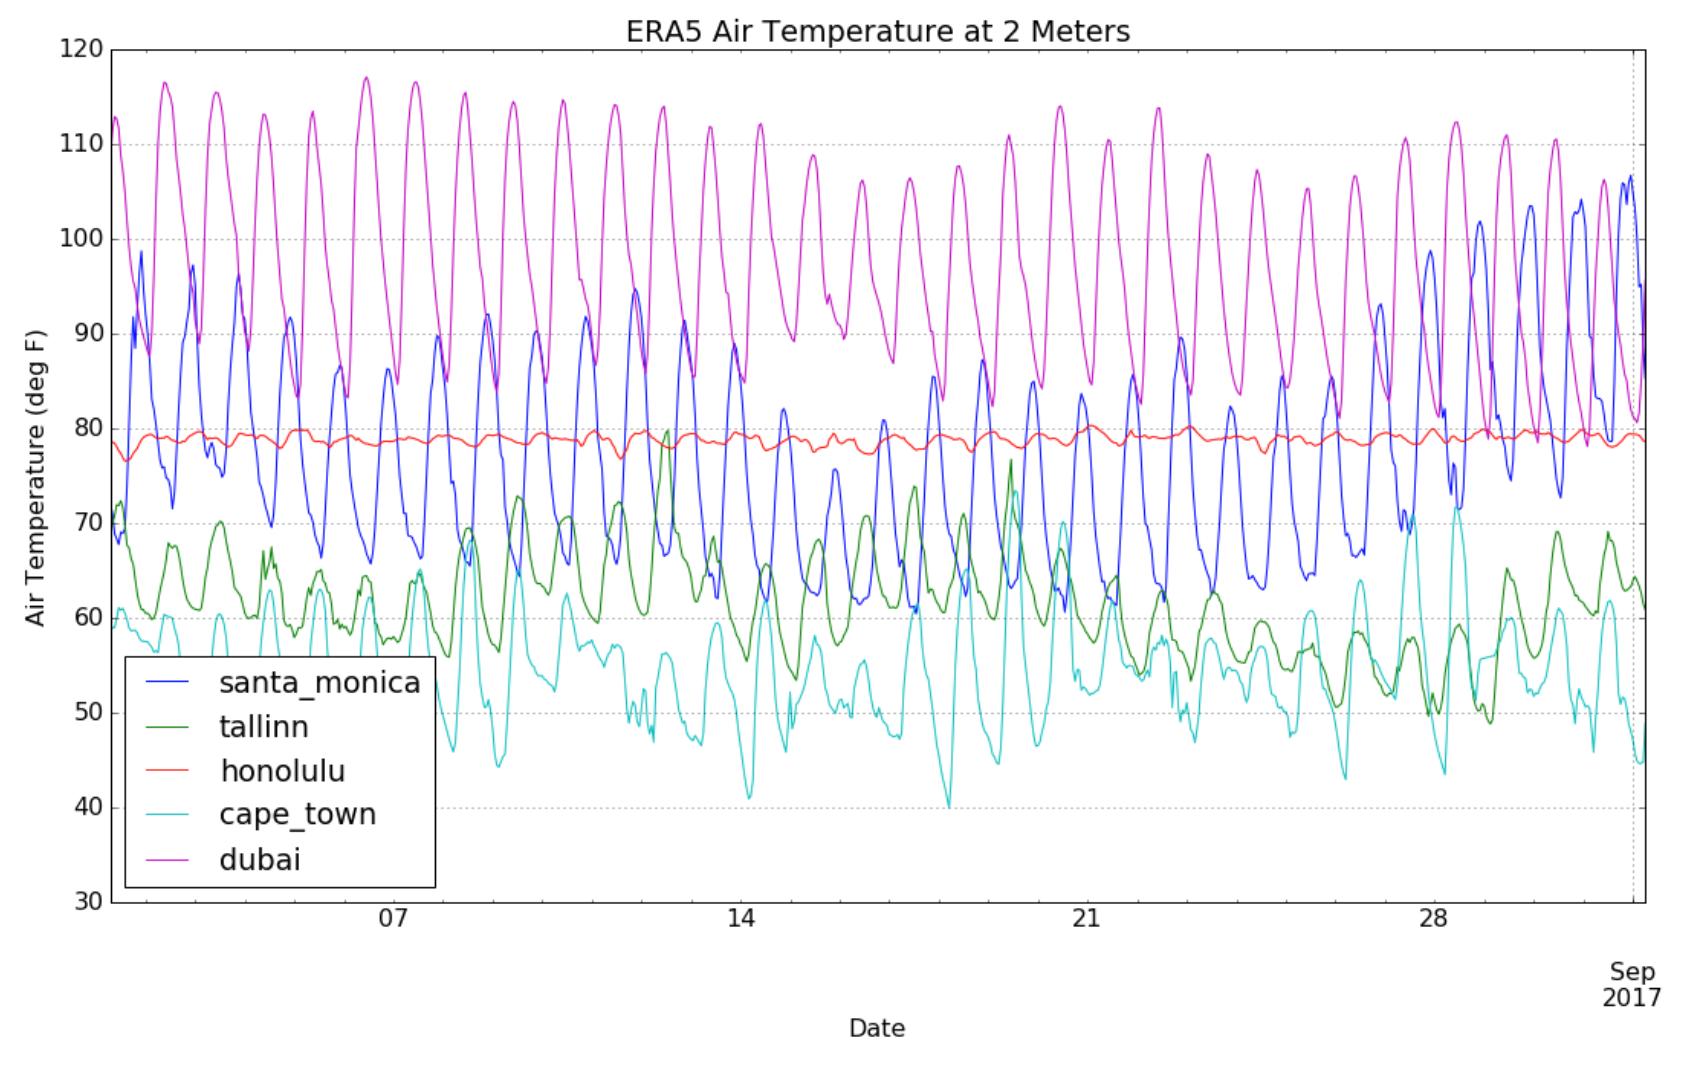 The ERA5 Reanalysis Dataset Provides a Sharper View on Past